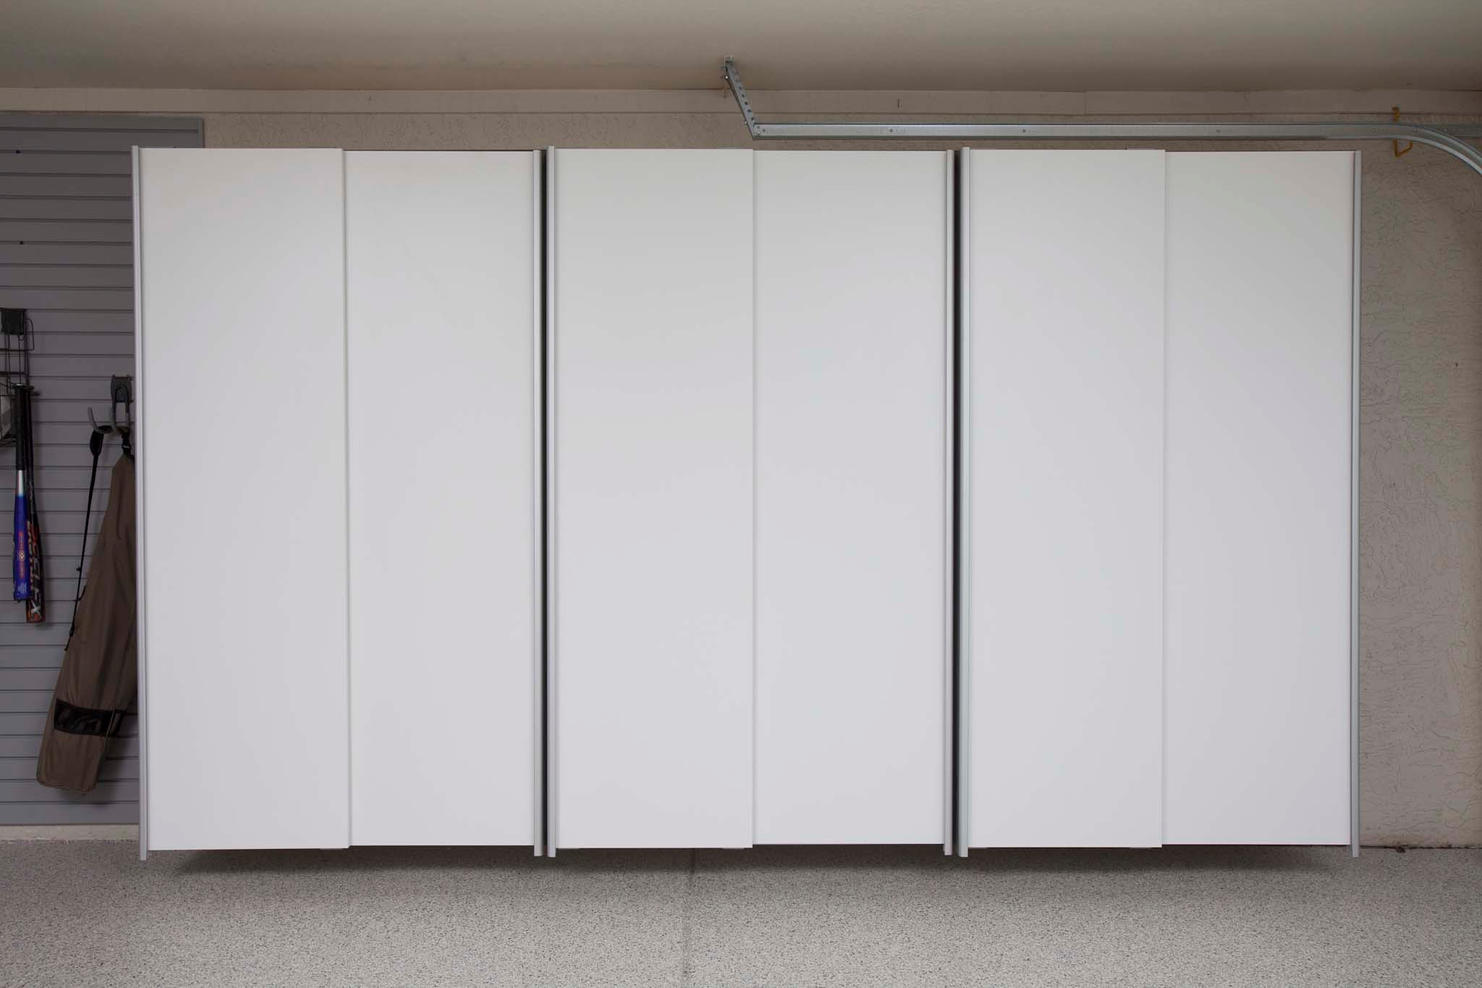 White Cabinets Sliding Doors Closed.jpg